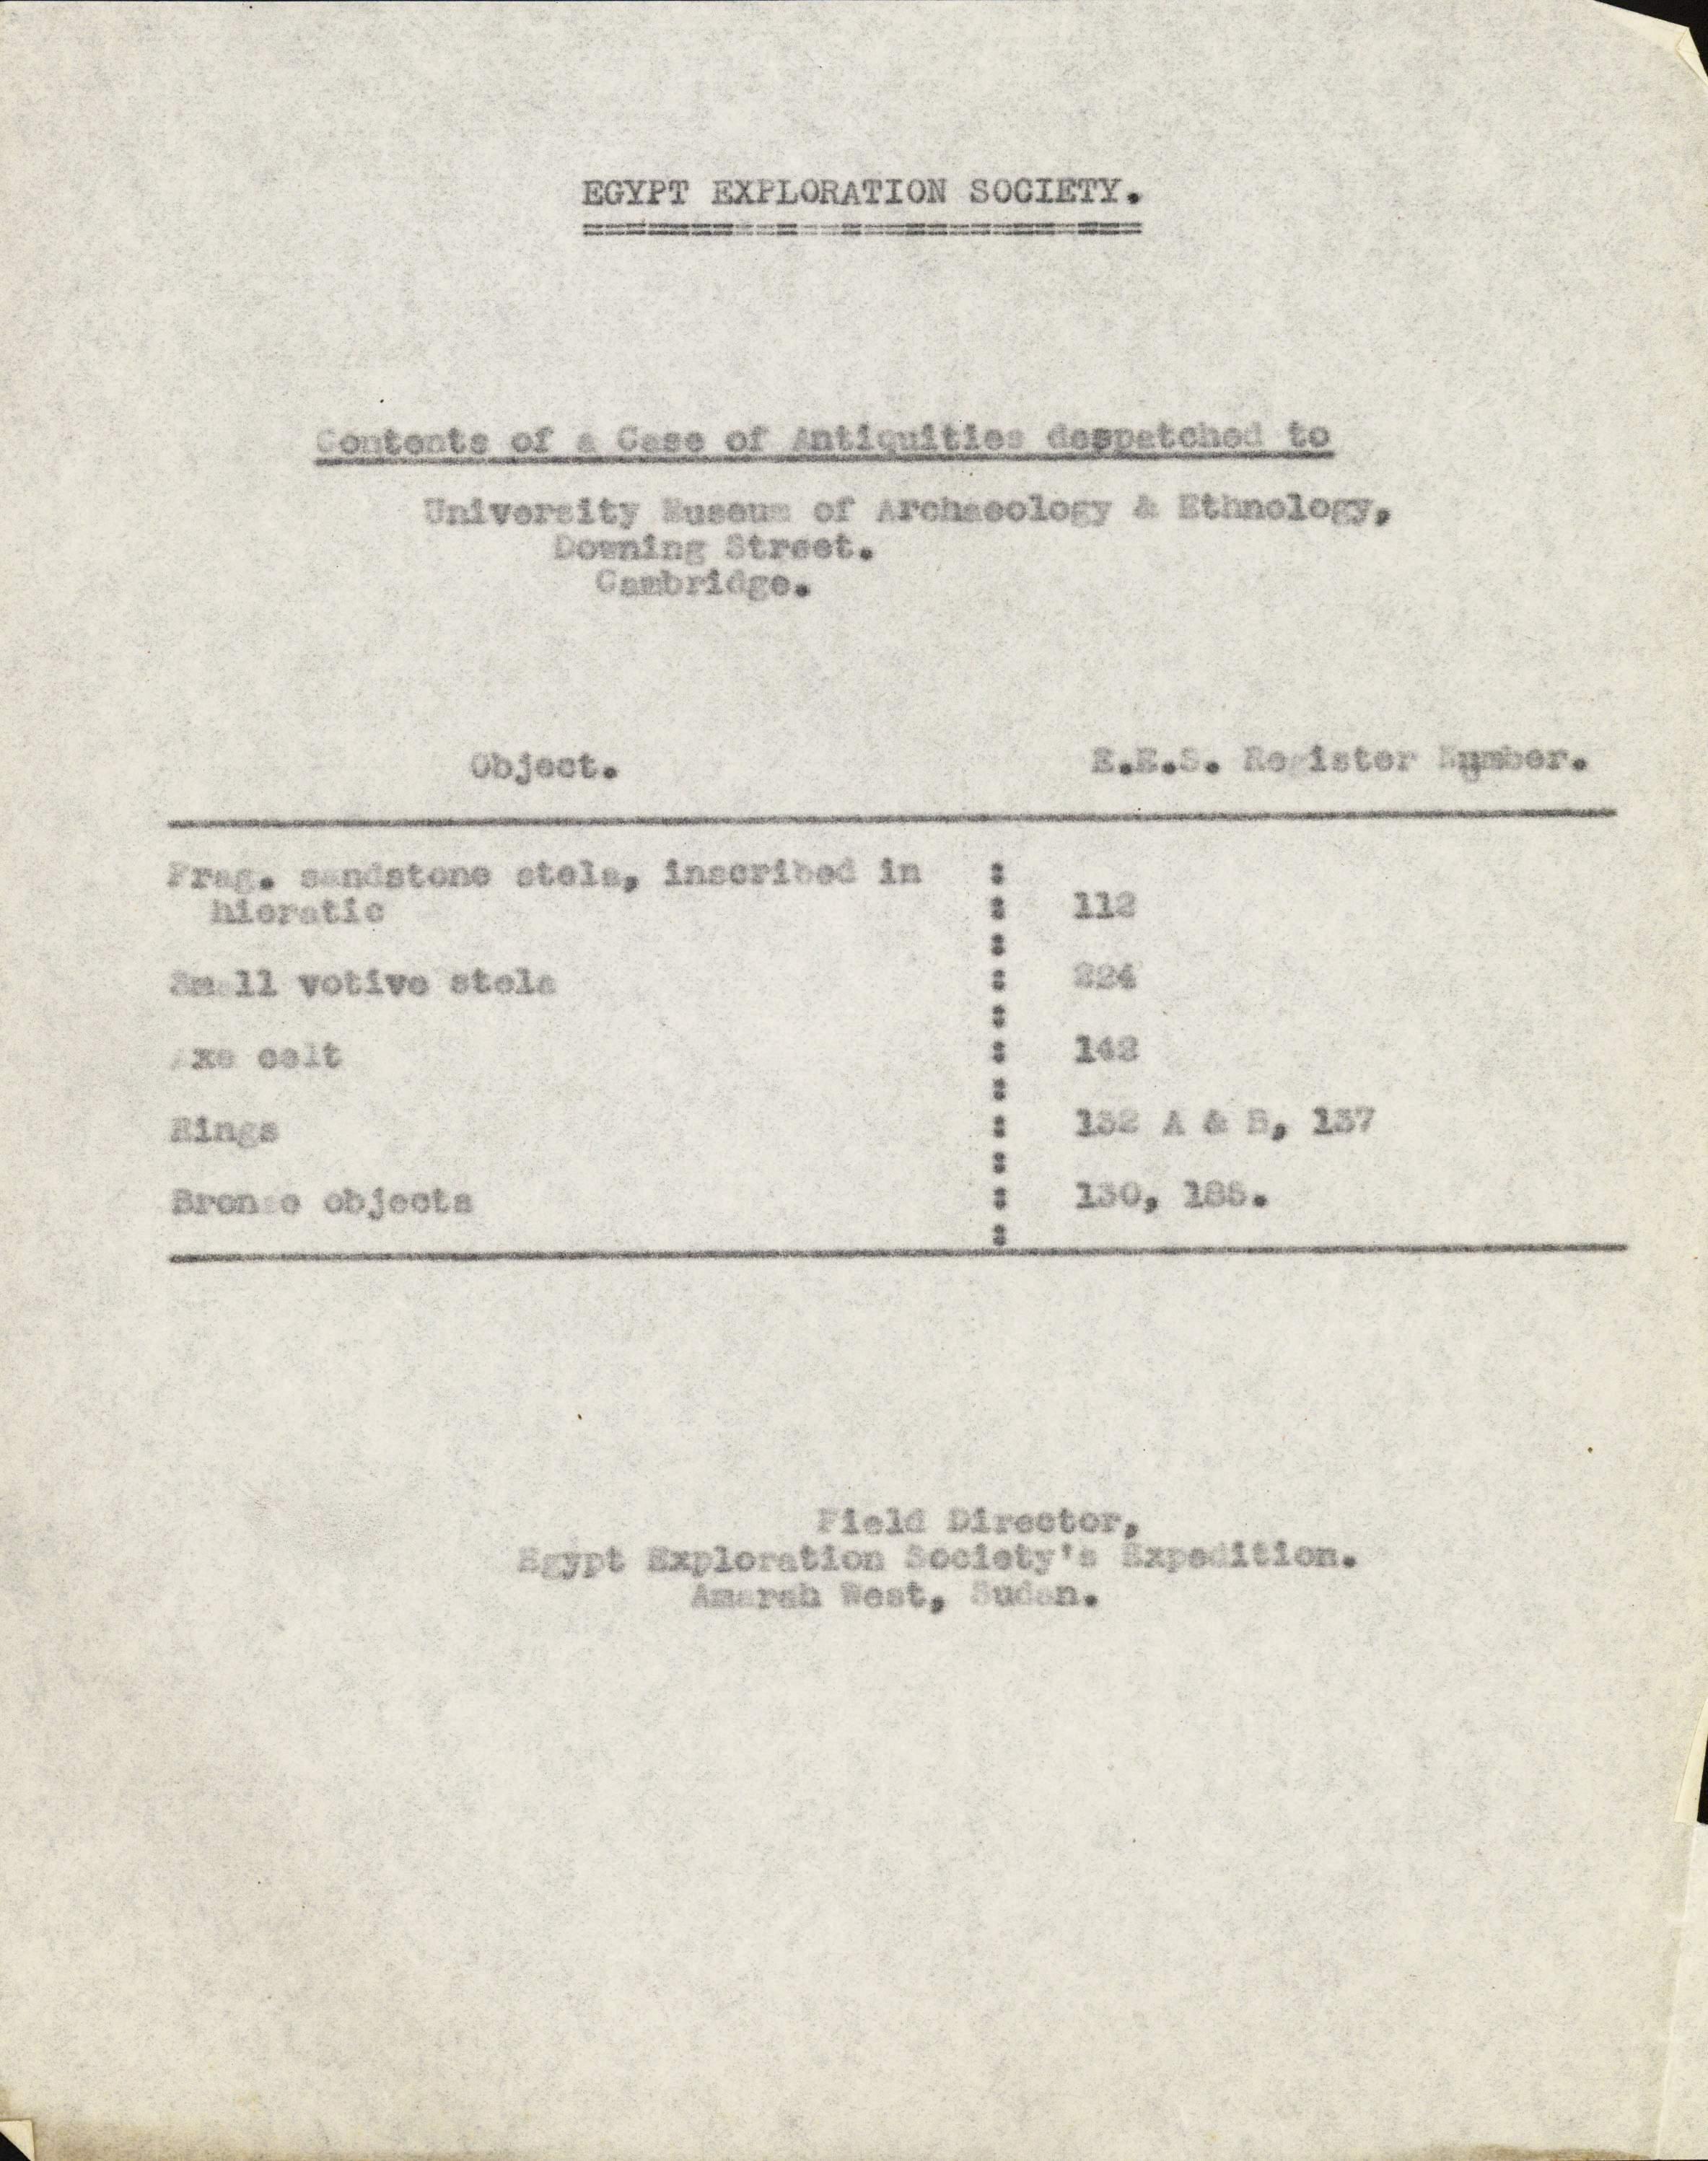 1938-1983 Amarah West, Sesebi DIST.63.10b